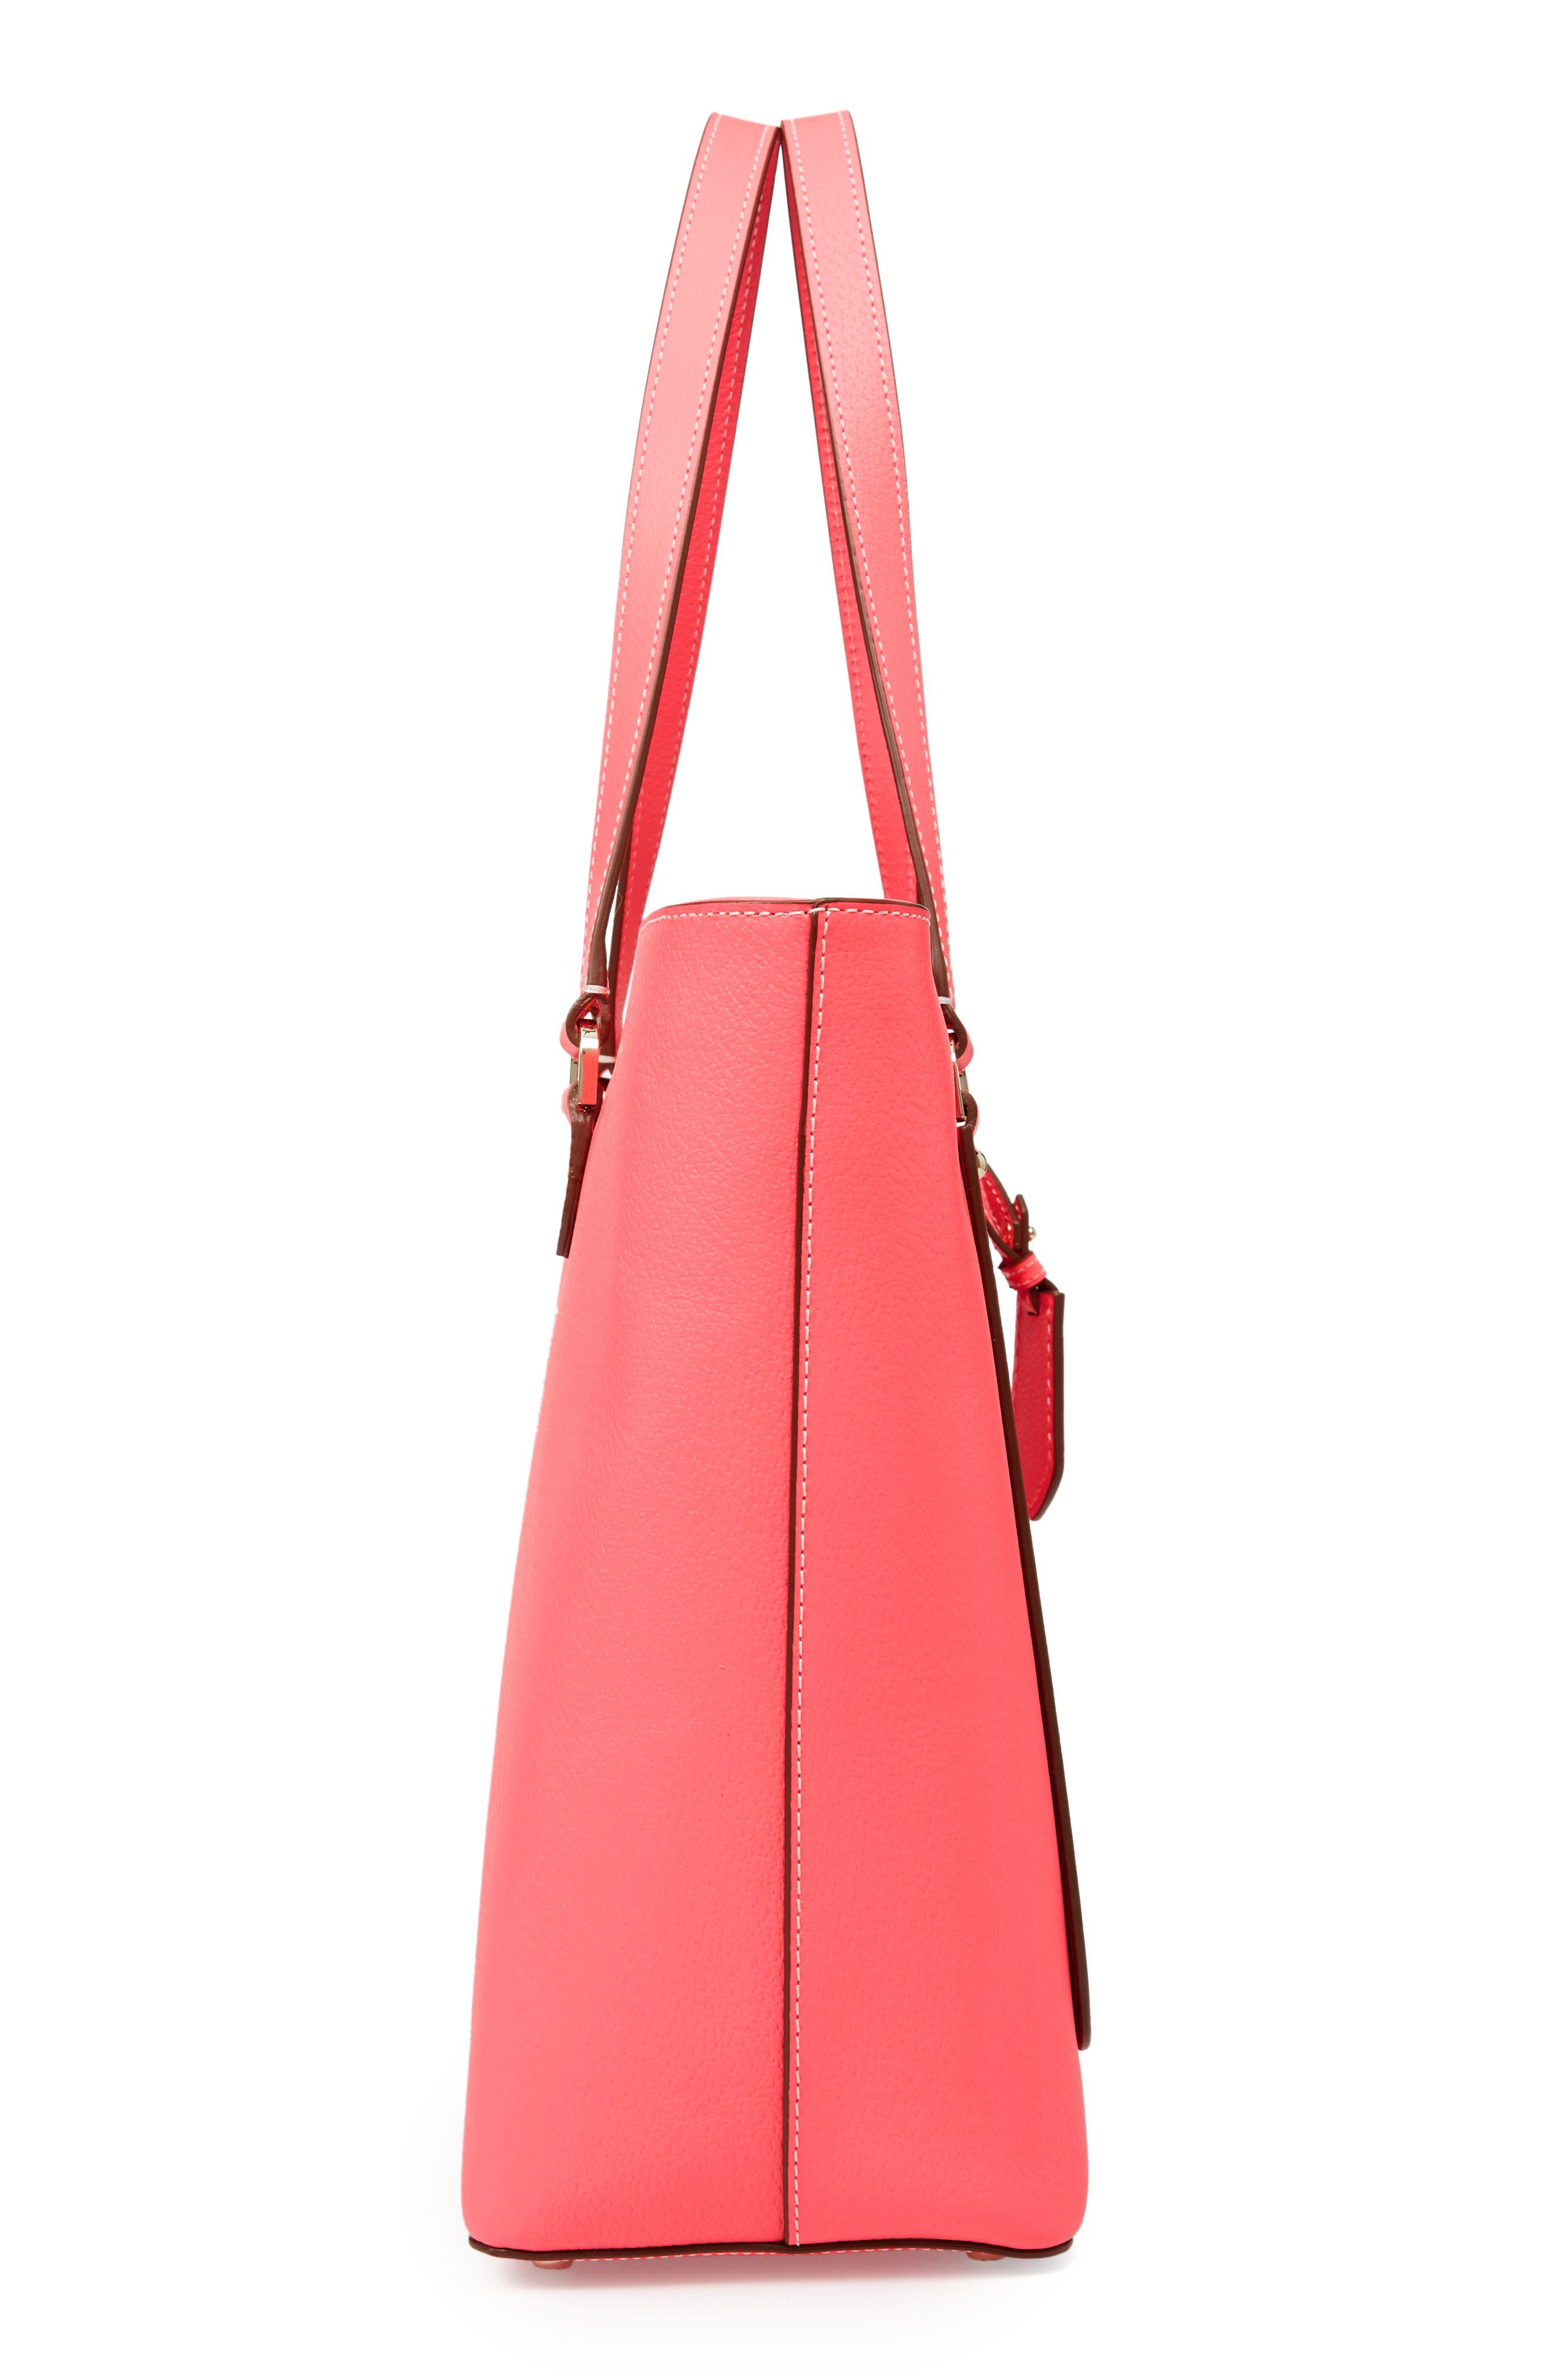 thompson street - kimberly leather tote,                             Alternate thumbnail 6, color,                             Bright Flamingo